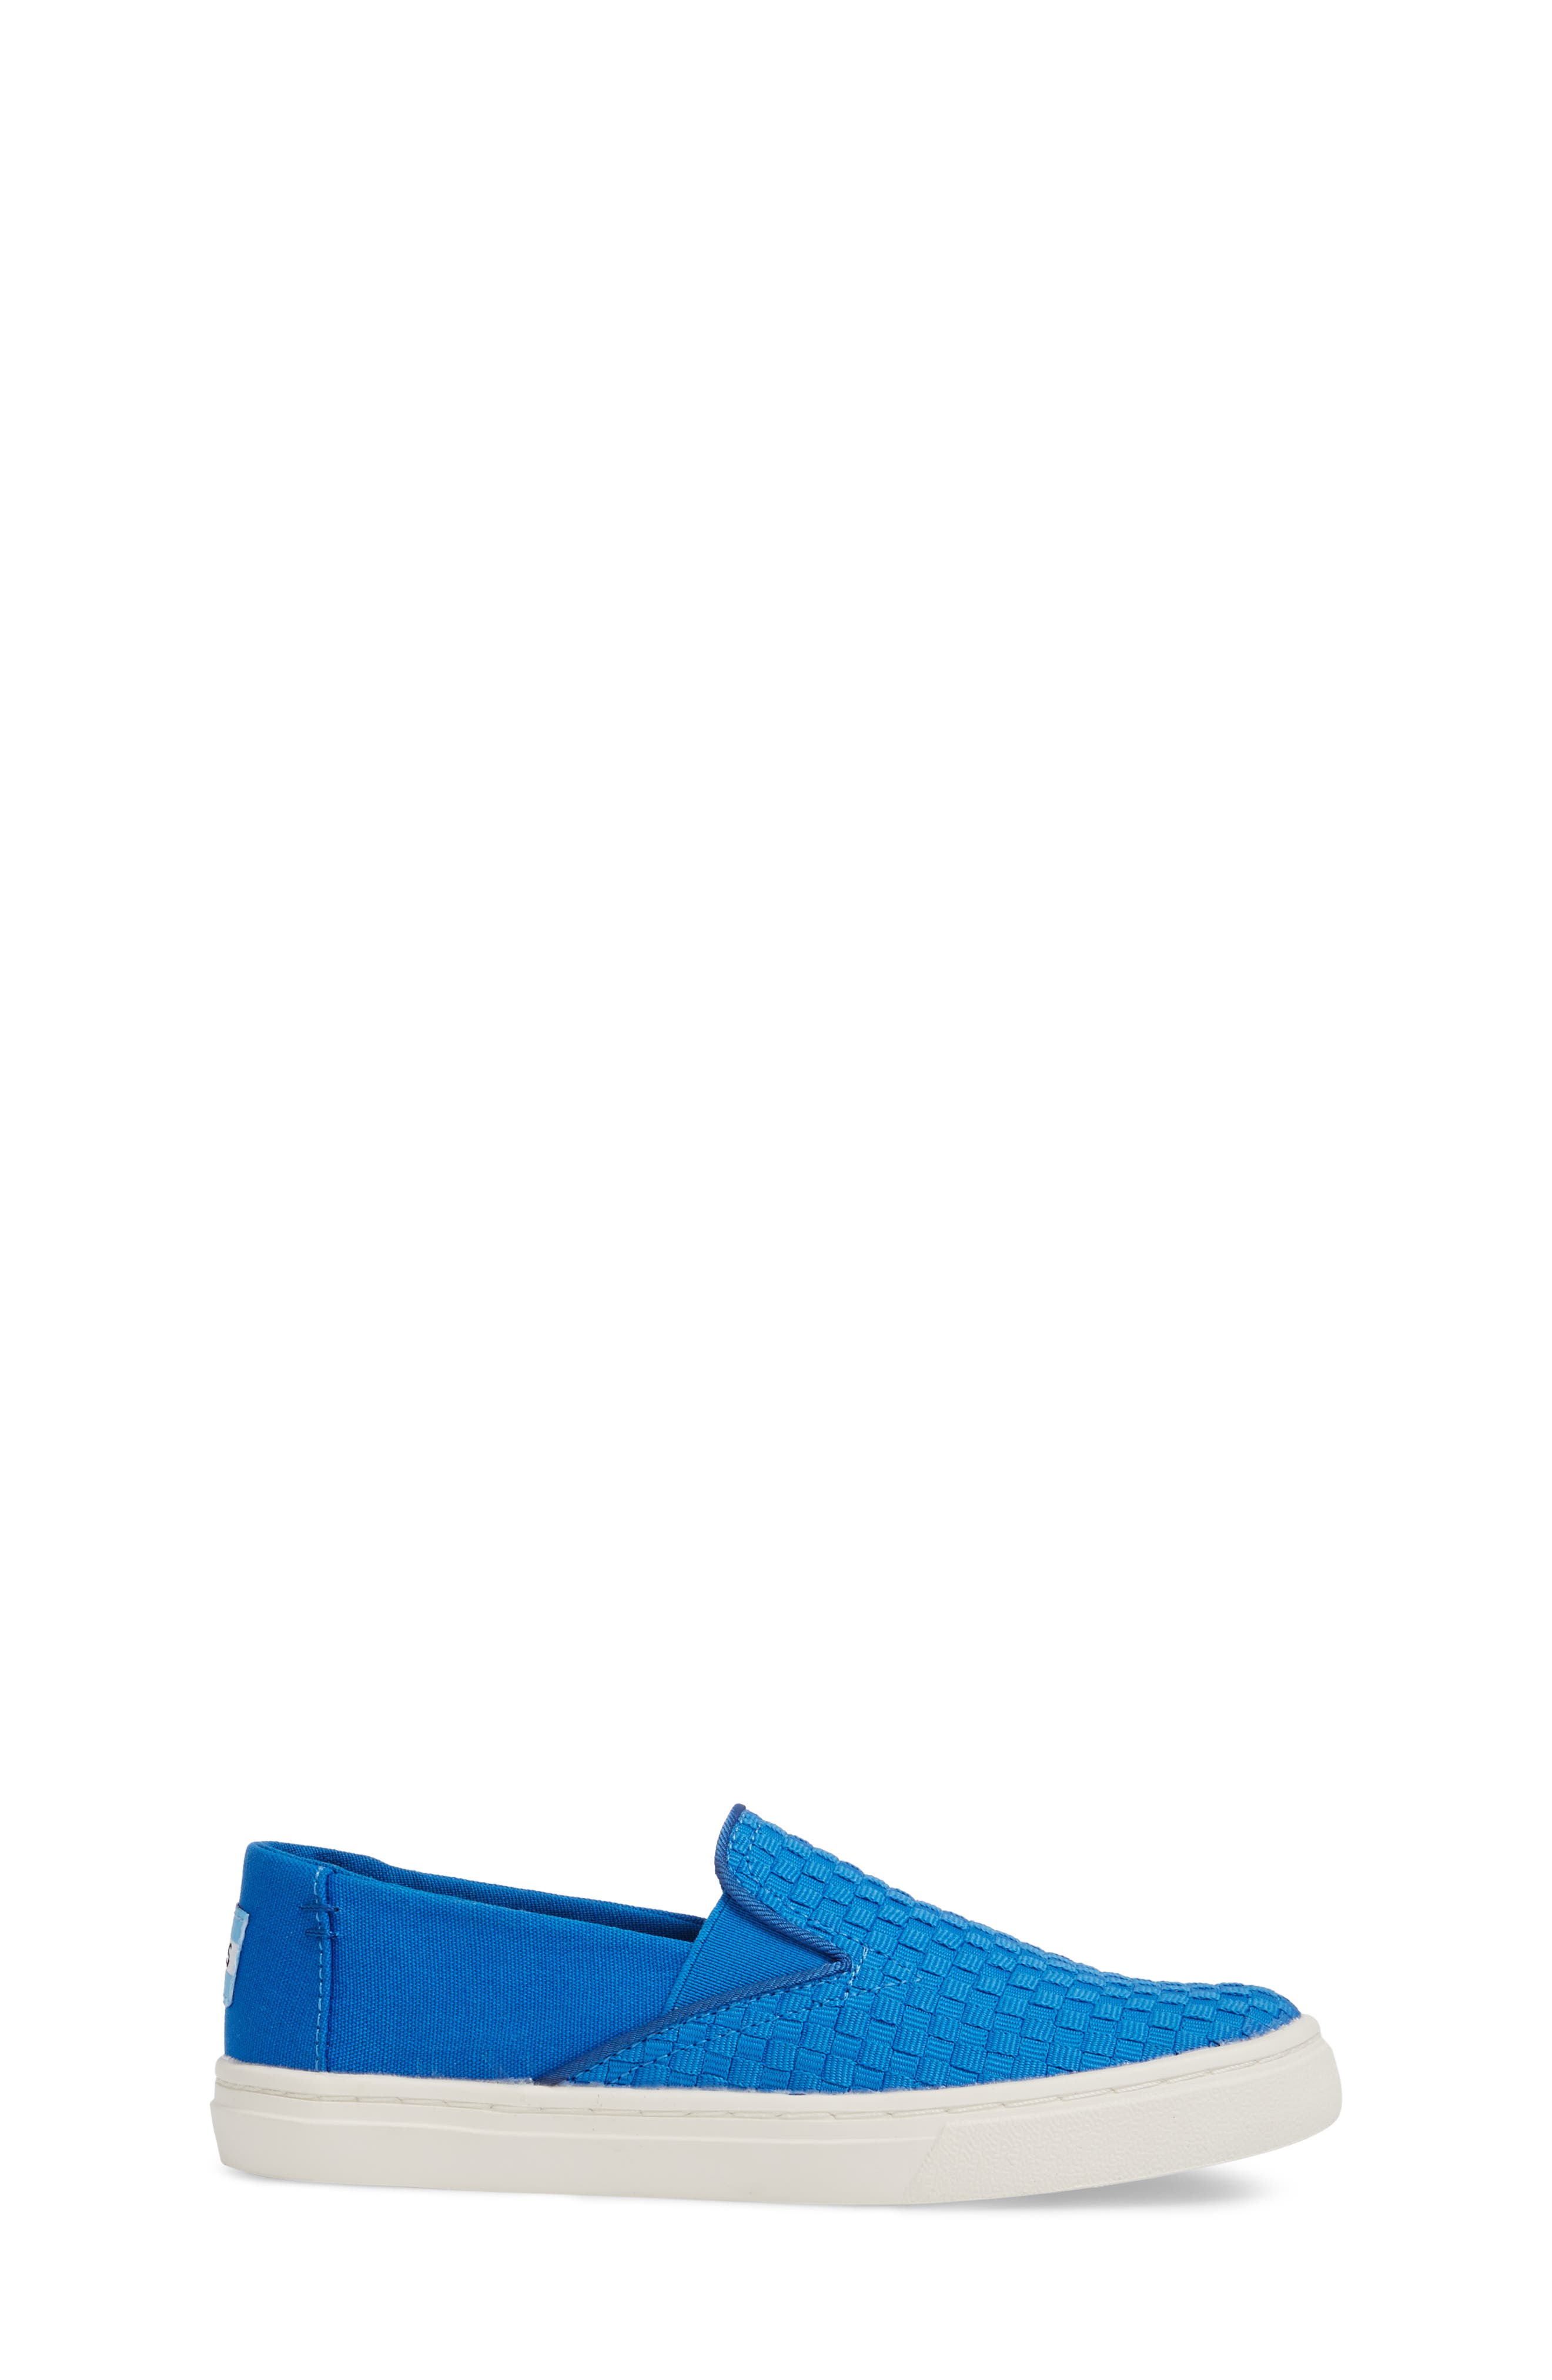 Luca Slip-On Sneaker,                             Alternate thumbnail 3, color,                             Imperial Blue Basketweave